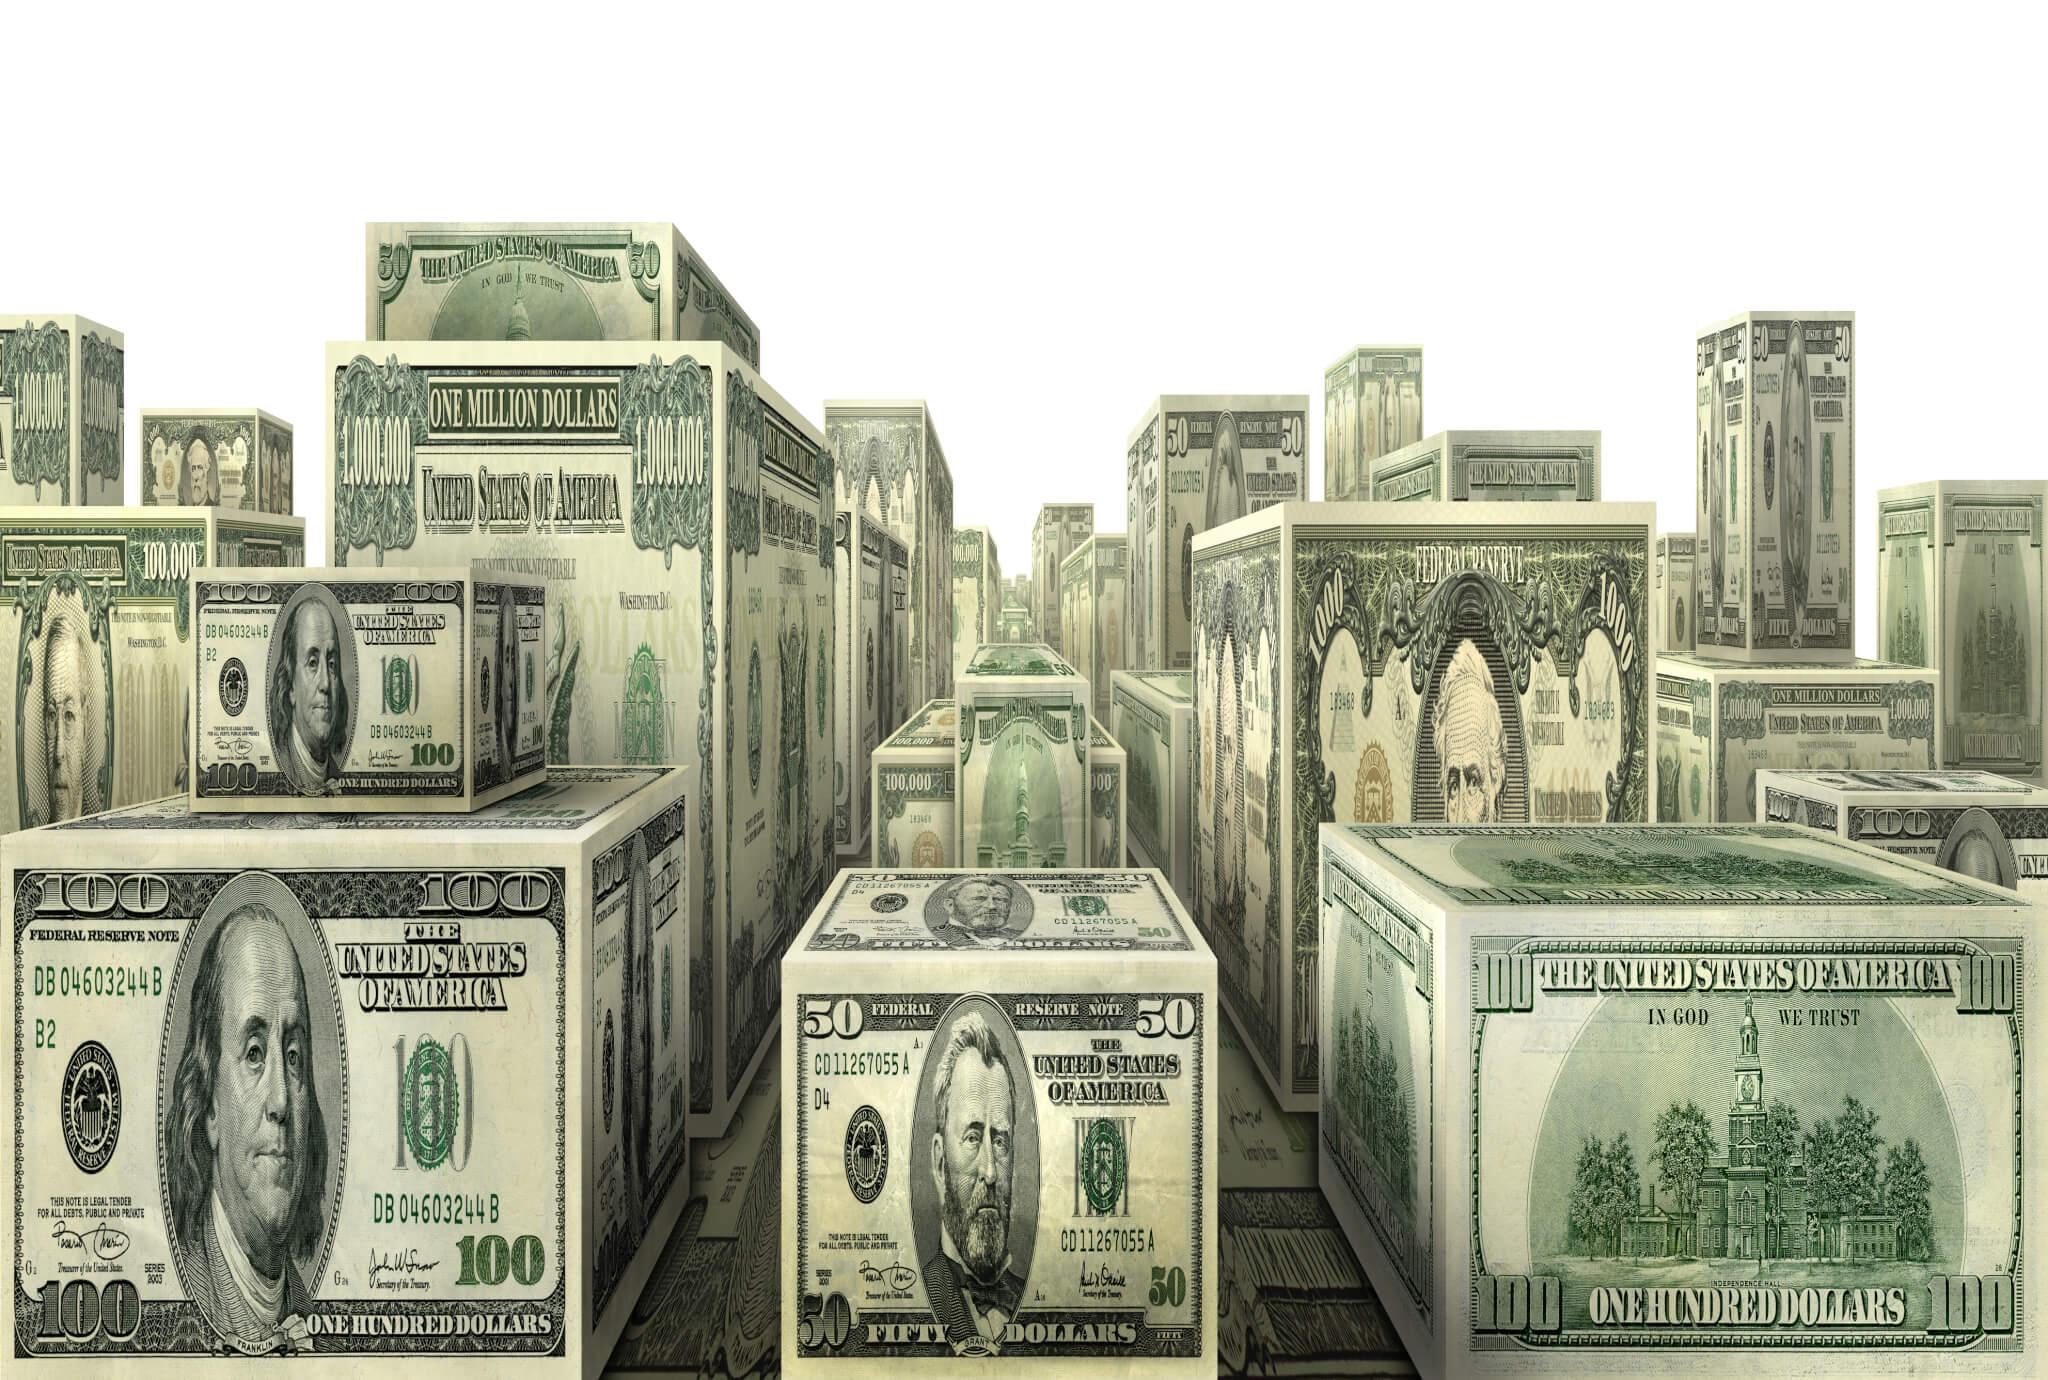 City Made of Money